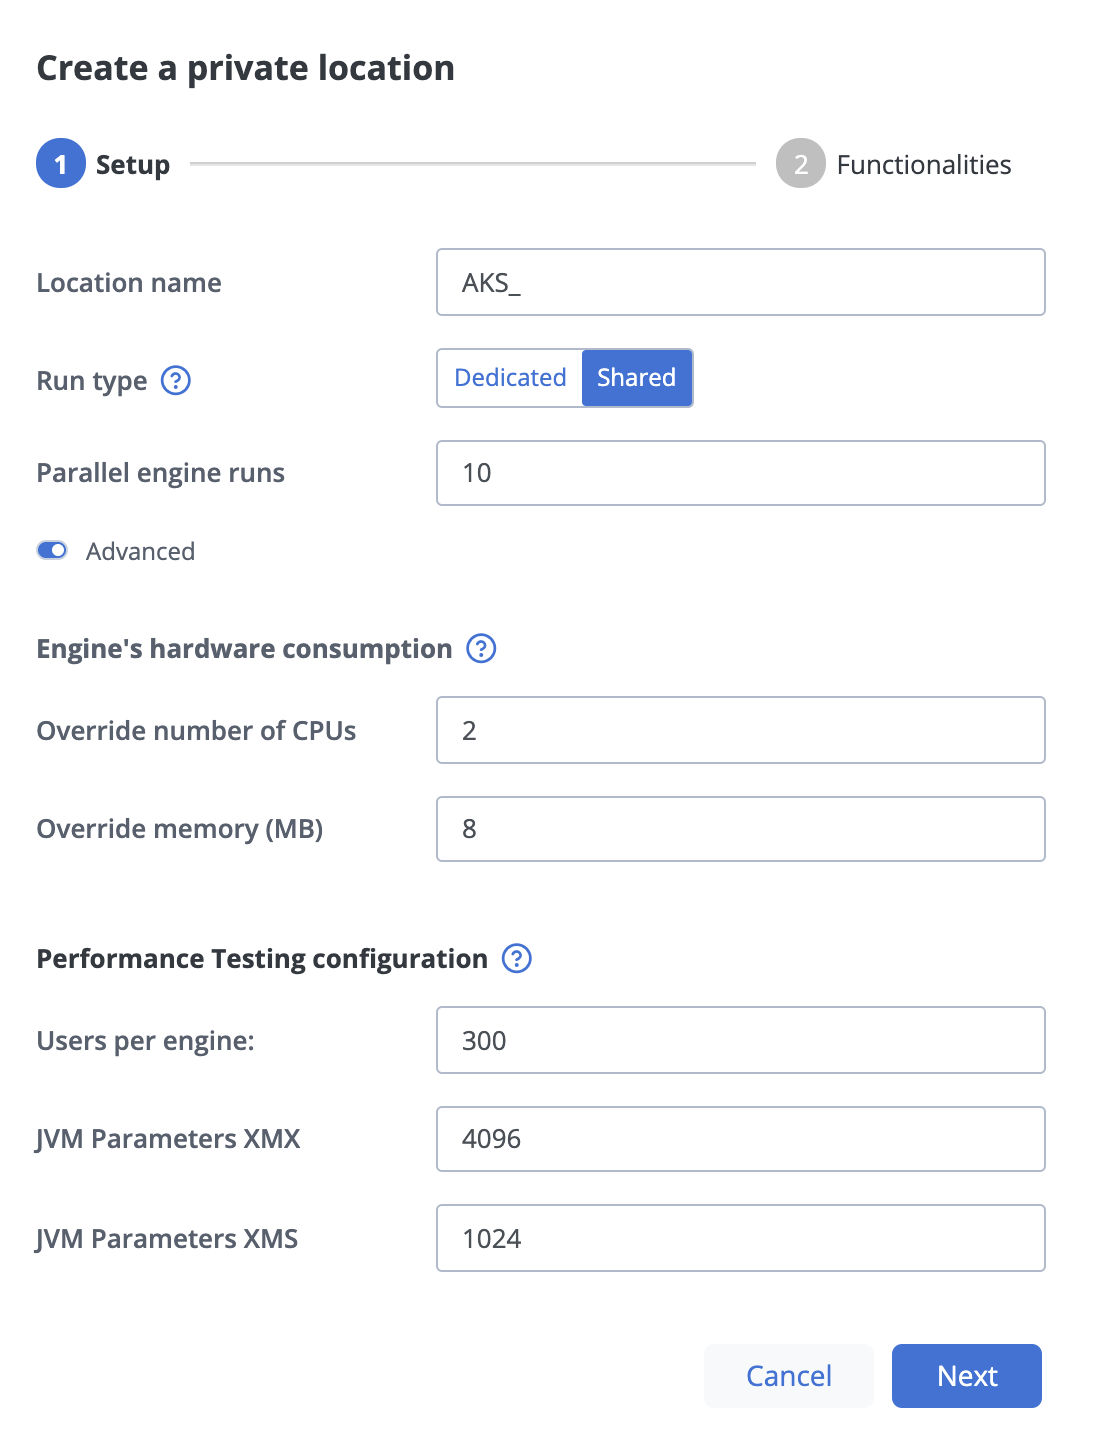 Deploying BlazeMeter Private Locations on Azure Kubernetes Service